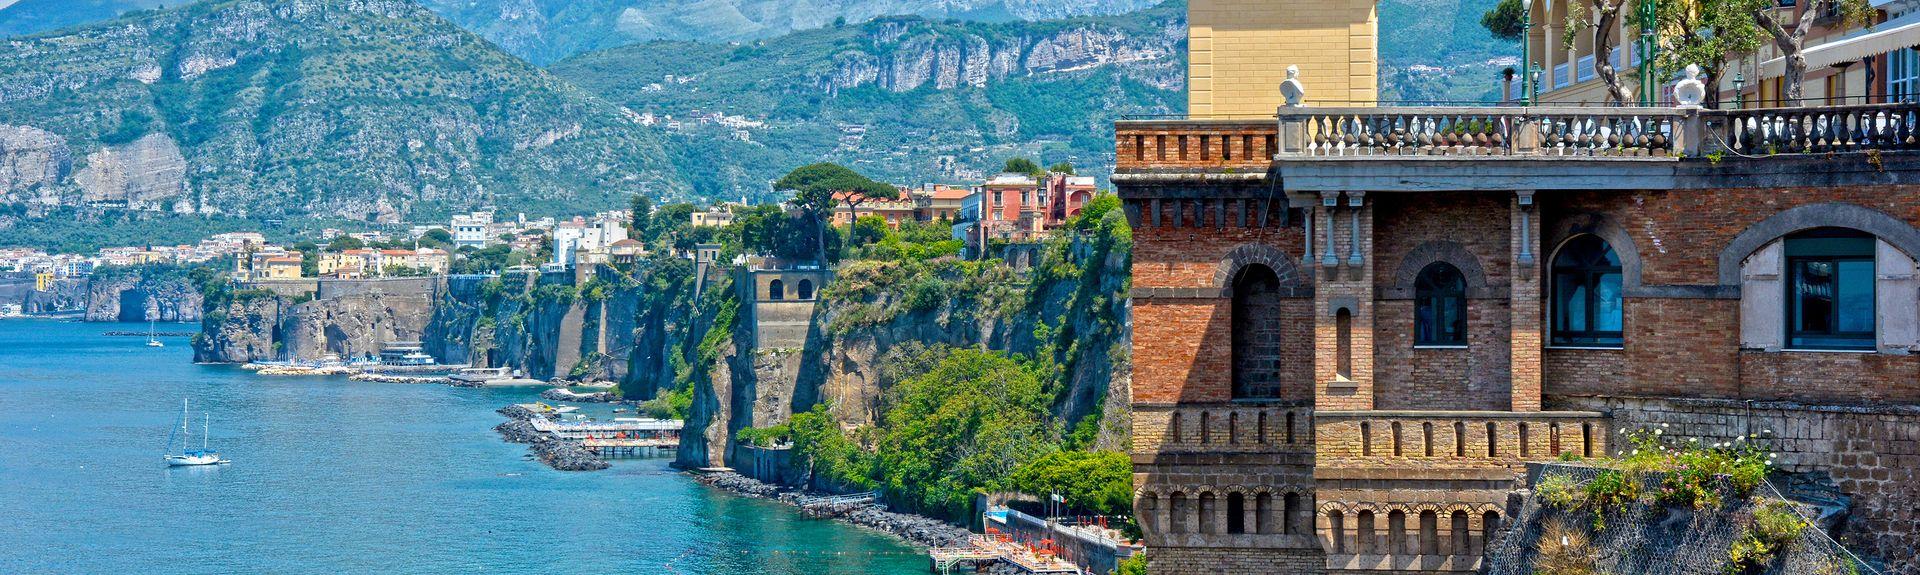 Sorrento, Campania, Italië